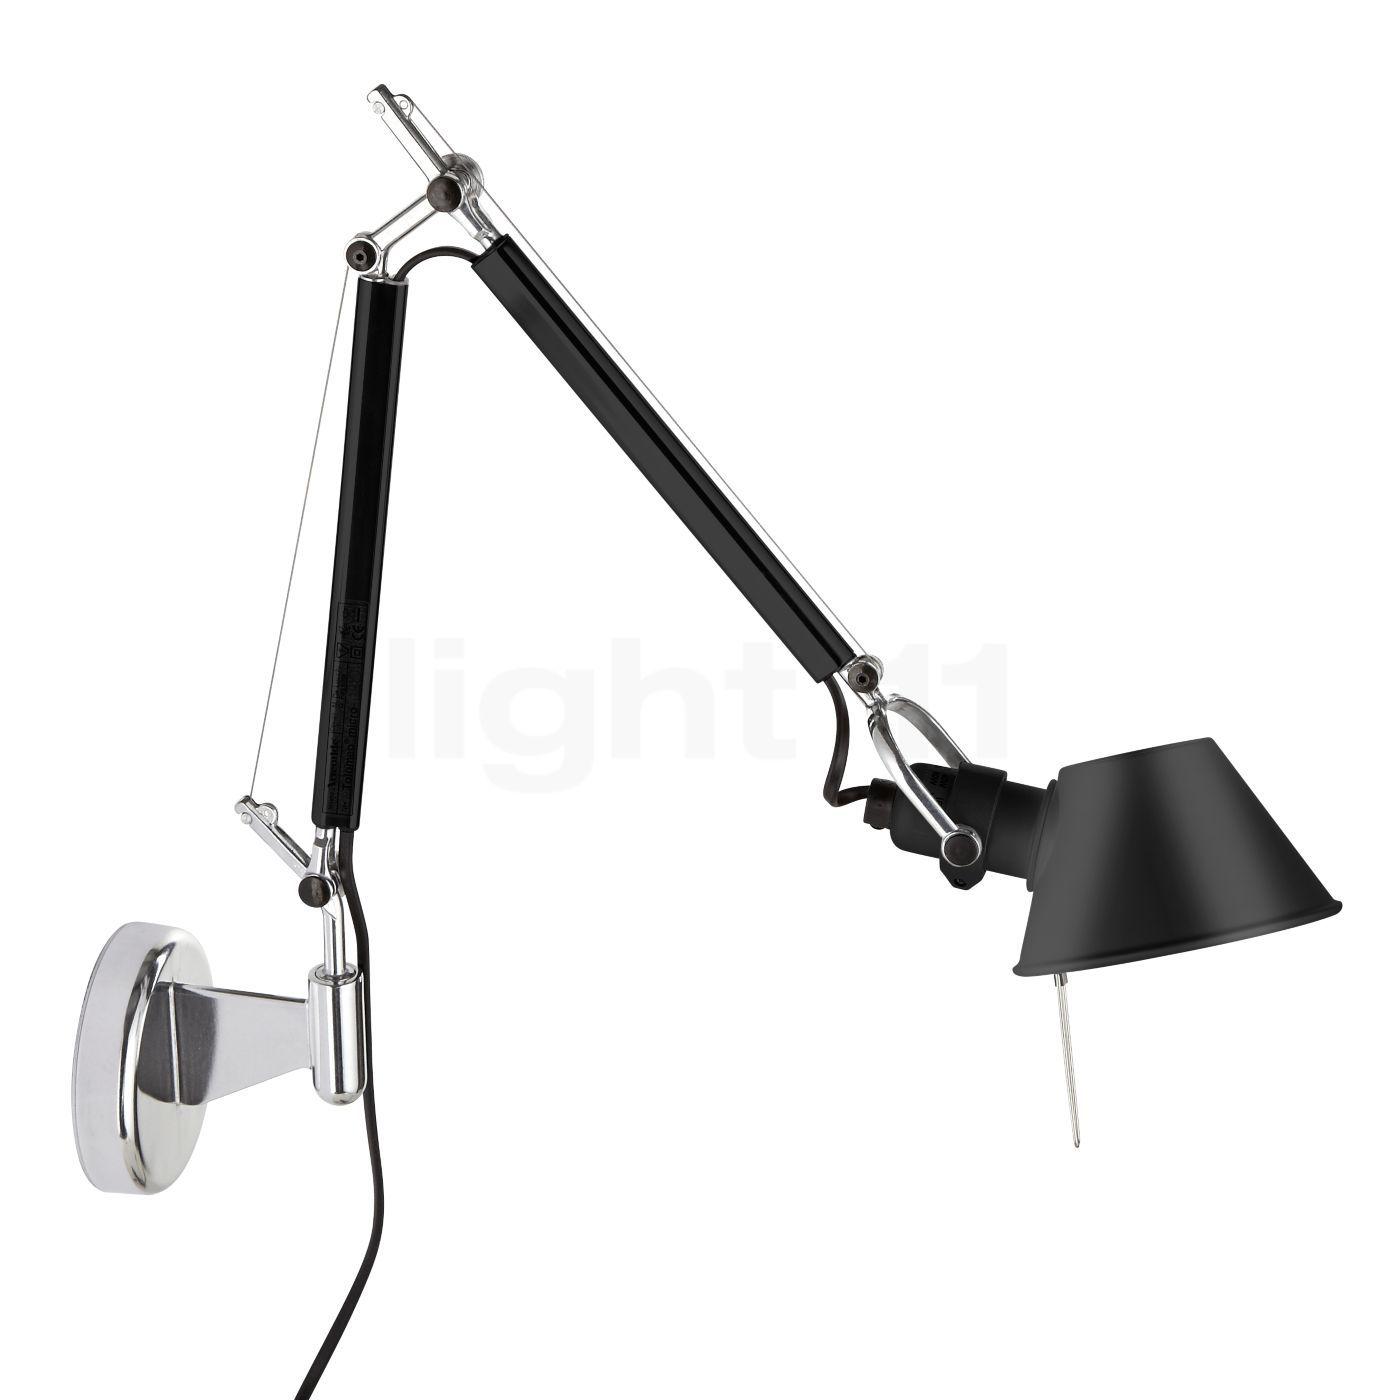 Buy Artemide Tolomeo Micro Parete At Light11 Eu Lamp Artemide Artemide Tolomeo Micro